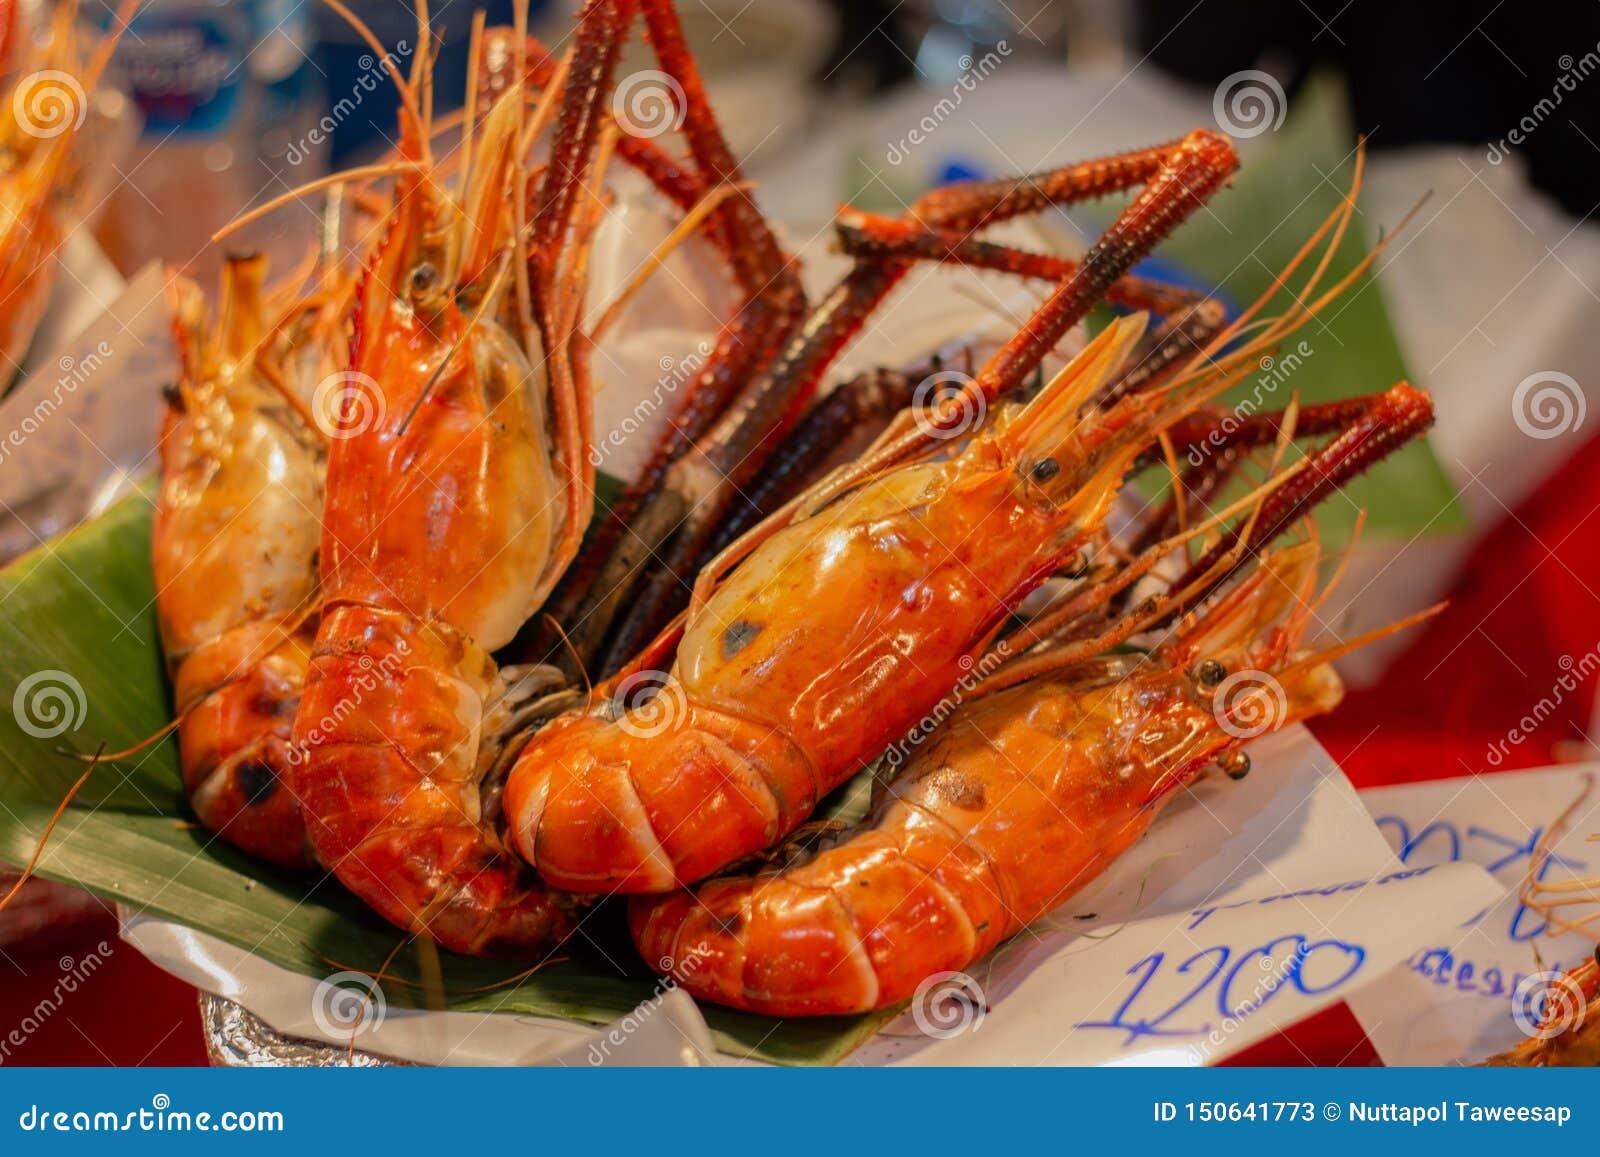 Delicidous Grilled Shrimps